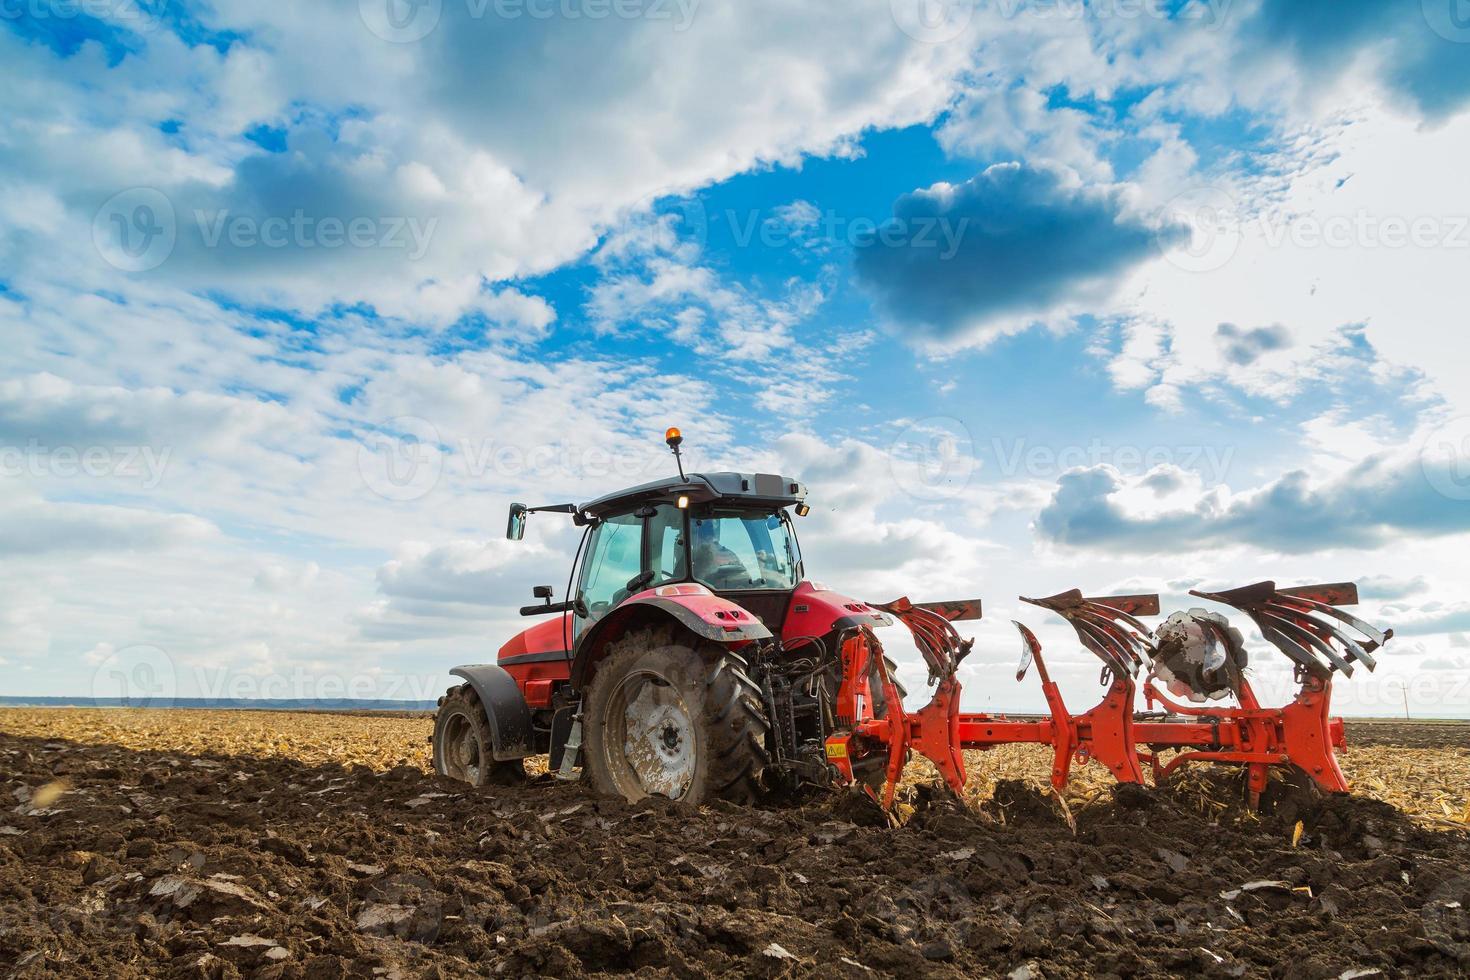 Bauernpflugfeld im roten Reittraktor foto